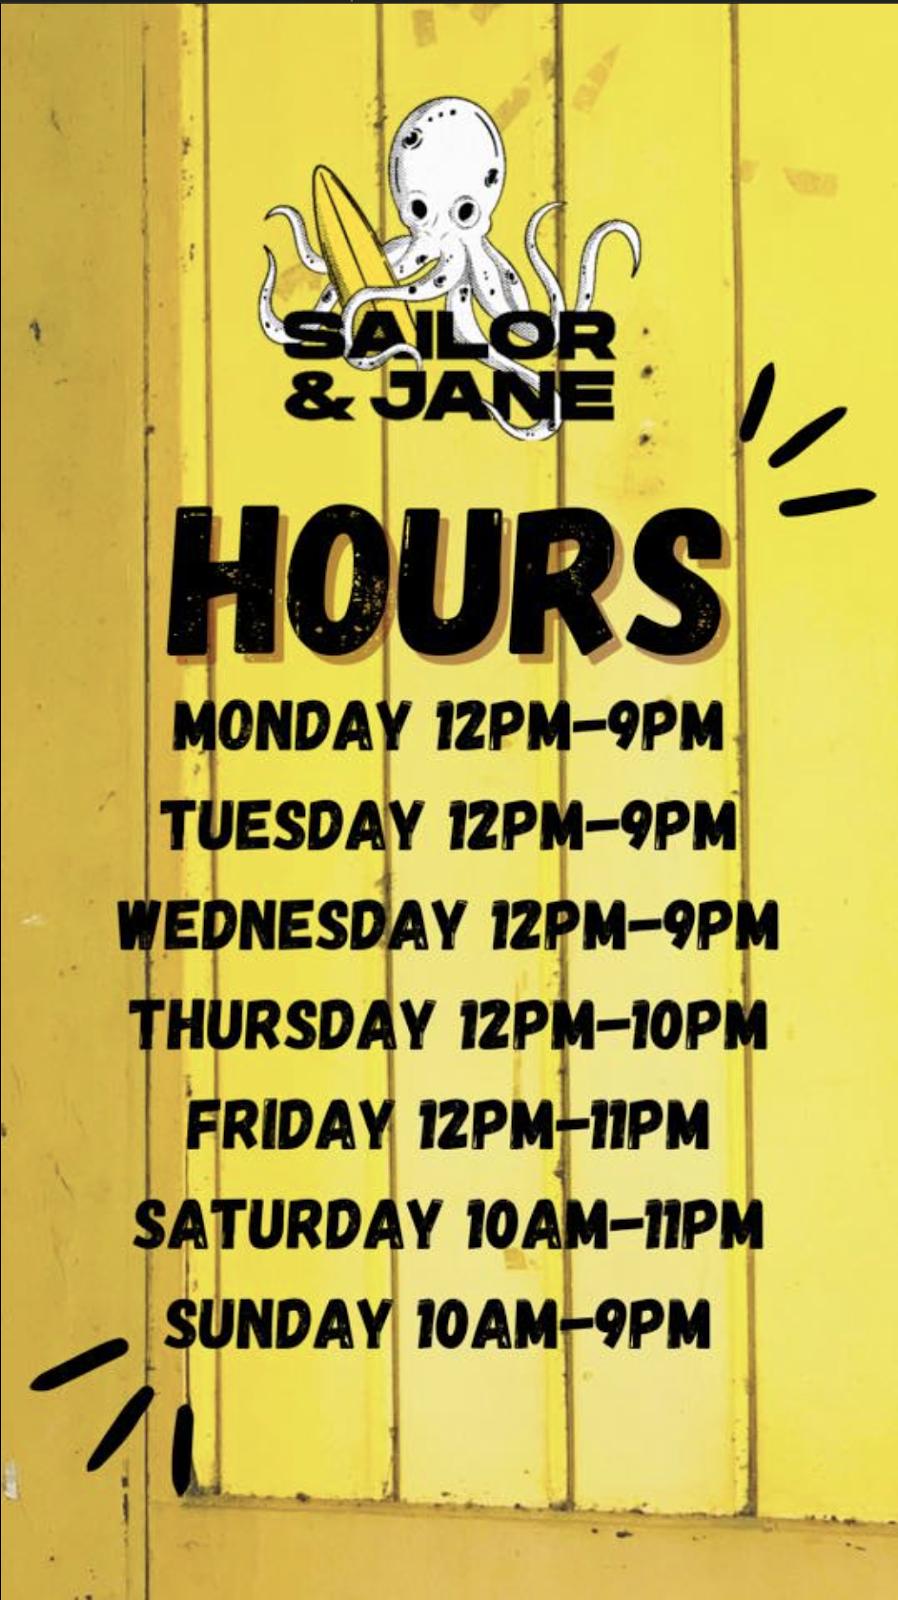 Sailor and Jane Eatery | restaurant | 1 Jane St, Miramichi, NB E1V 2S6, Canada | 5066220354 OR +1 506-622-0354